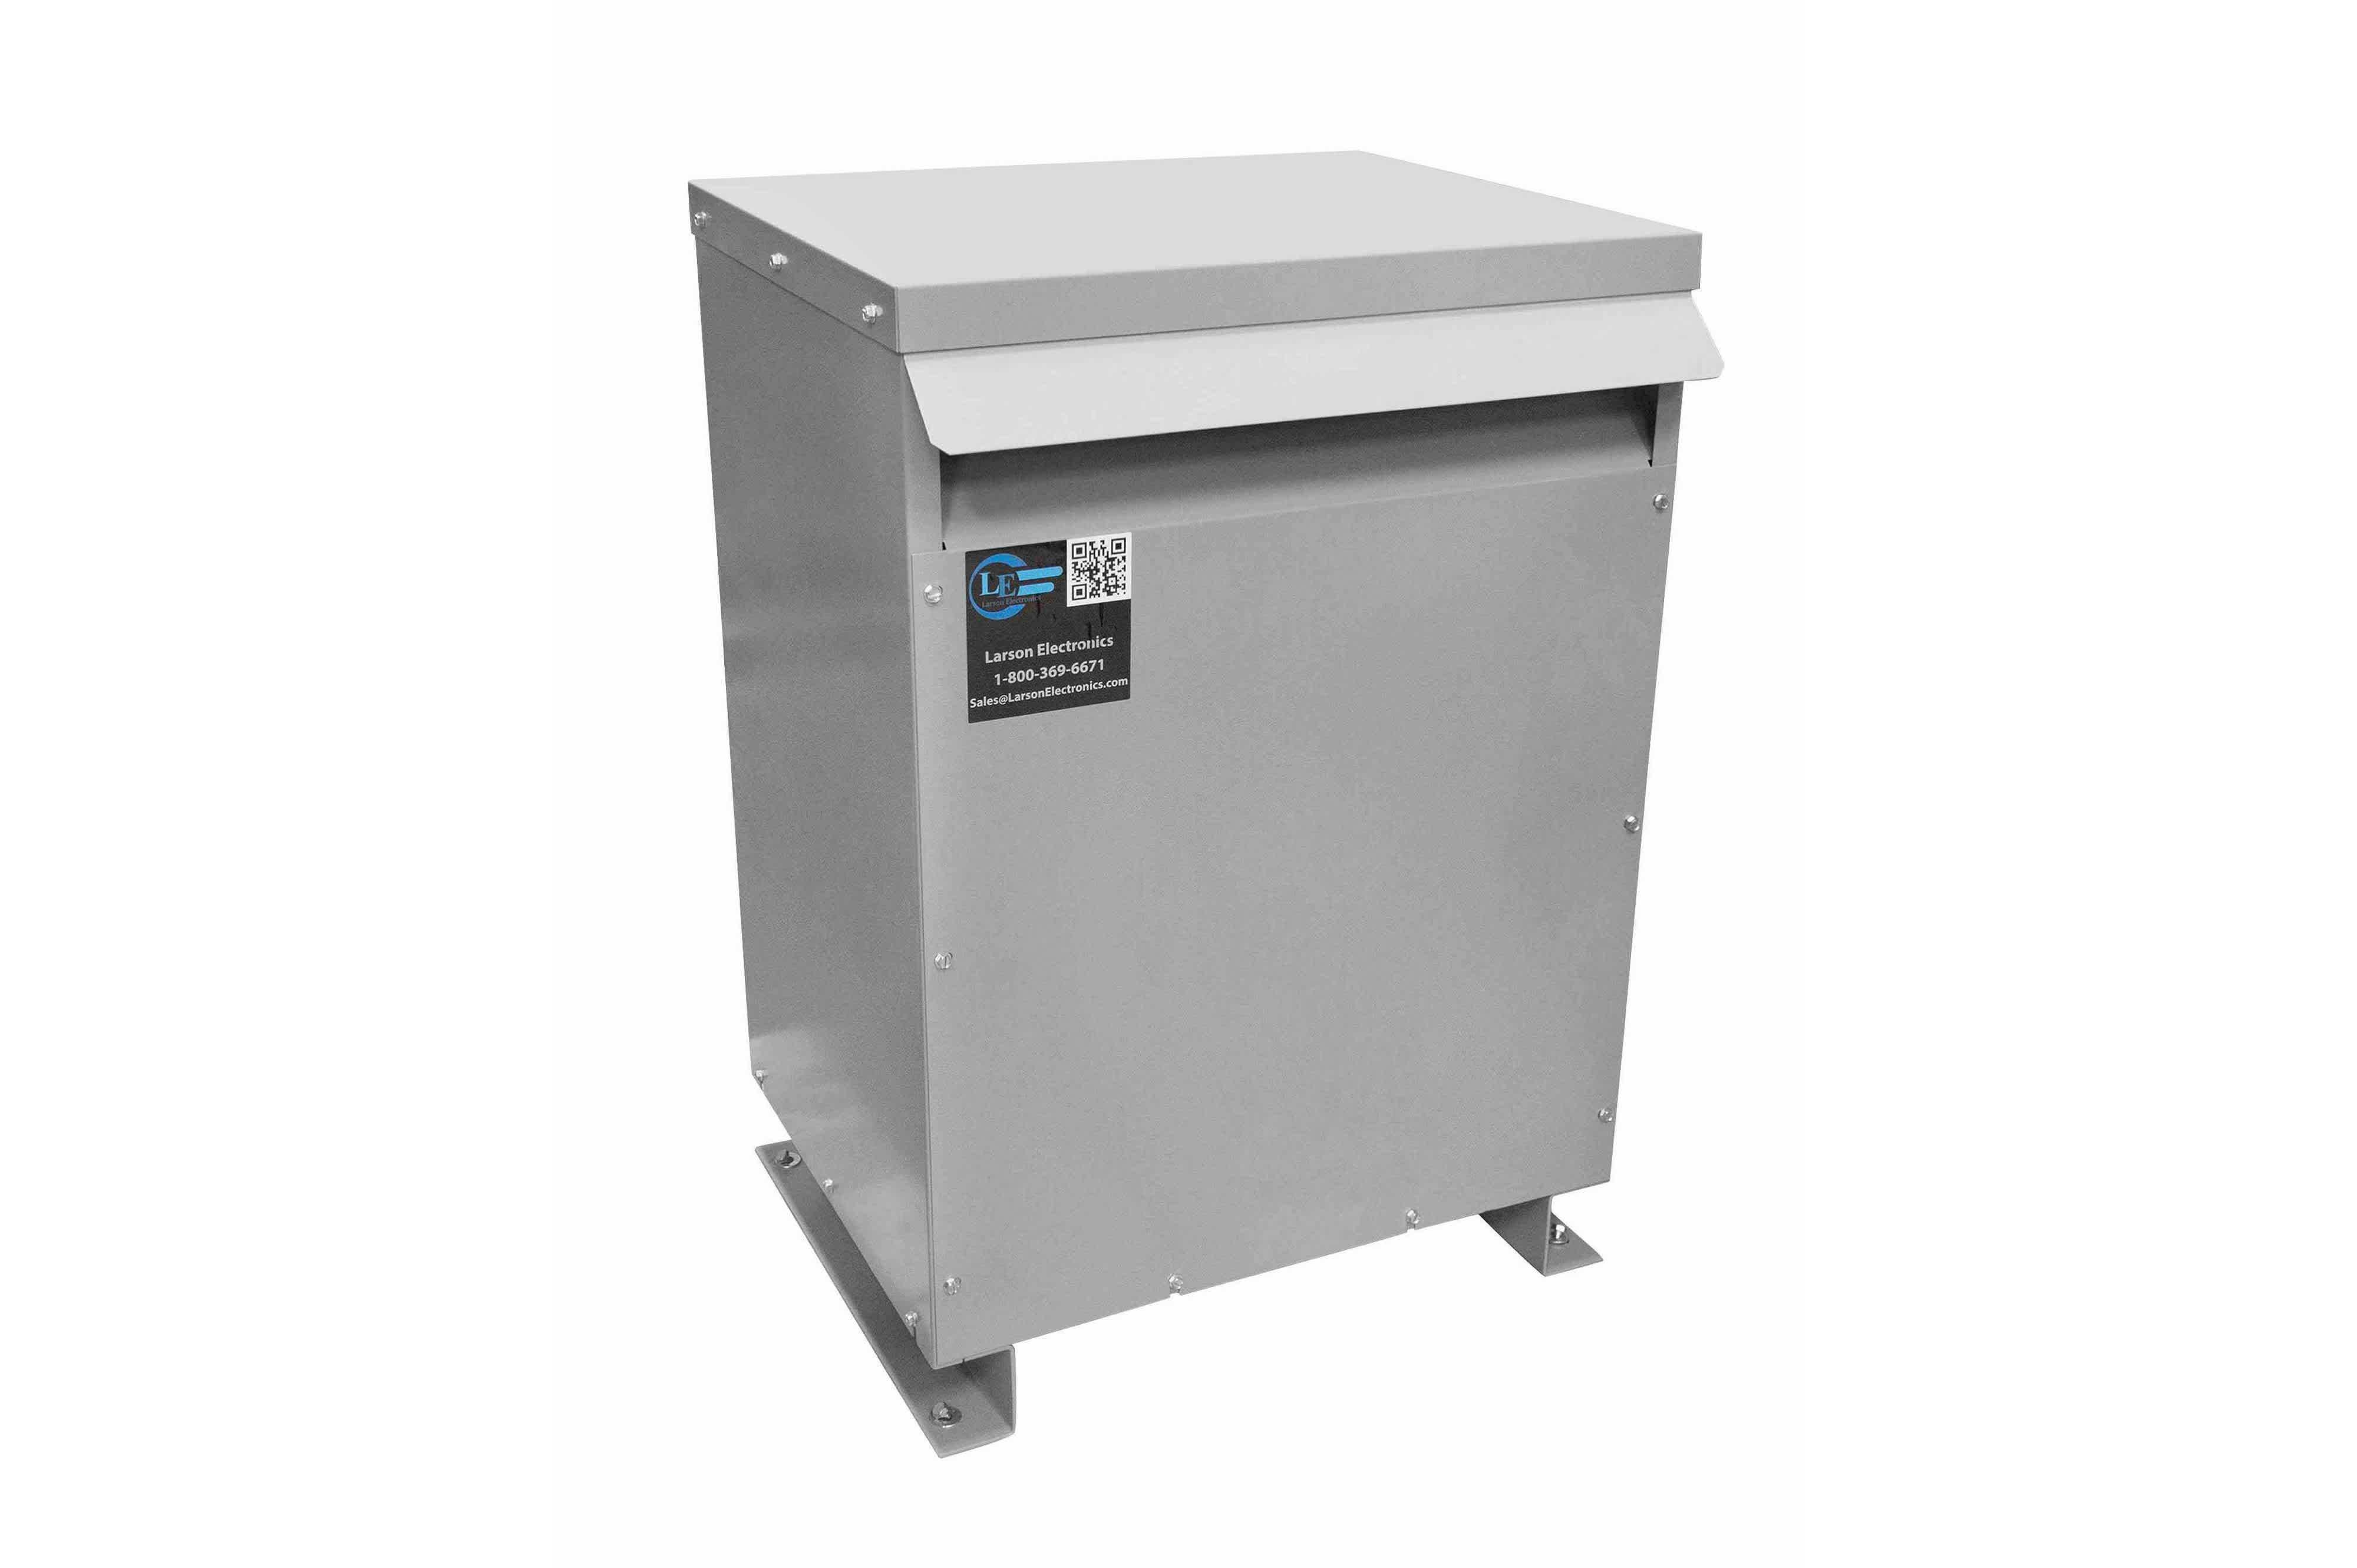 47.5 kVA 3PH Isolation Transformer, 600V Wye Primary, 208V Delta Secondary, N3R, Ventilated, 60 Hz